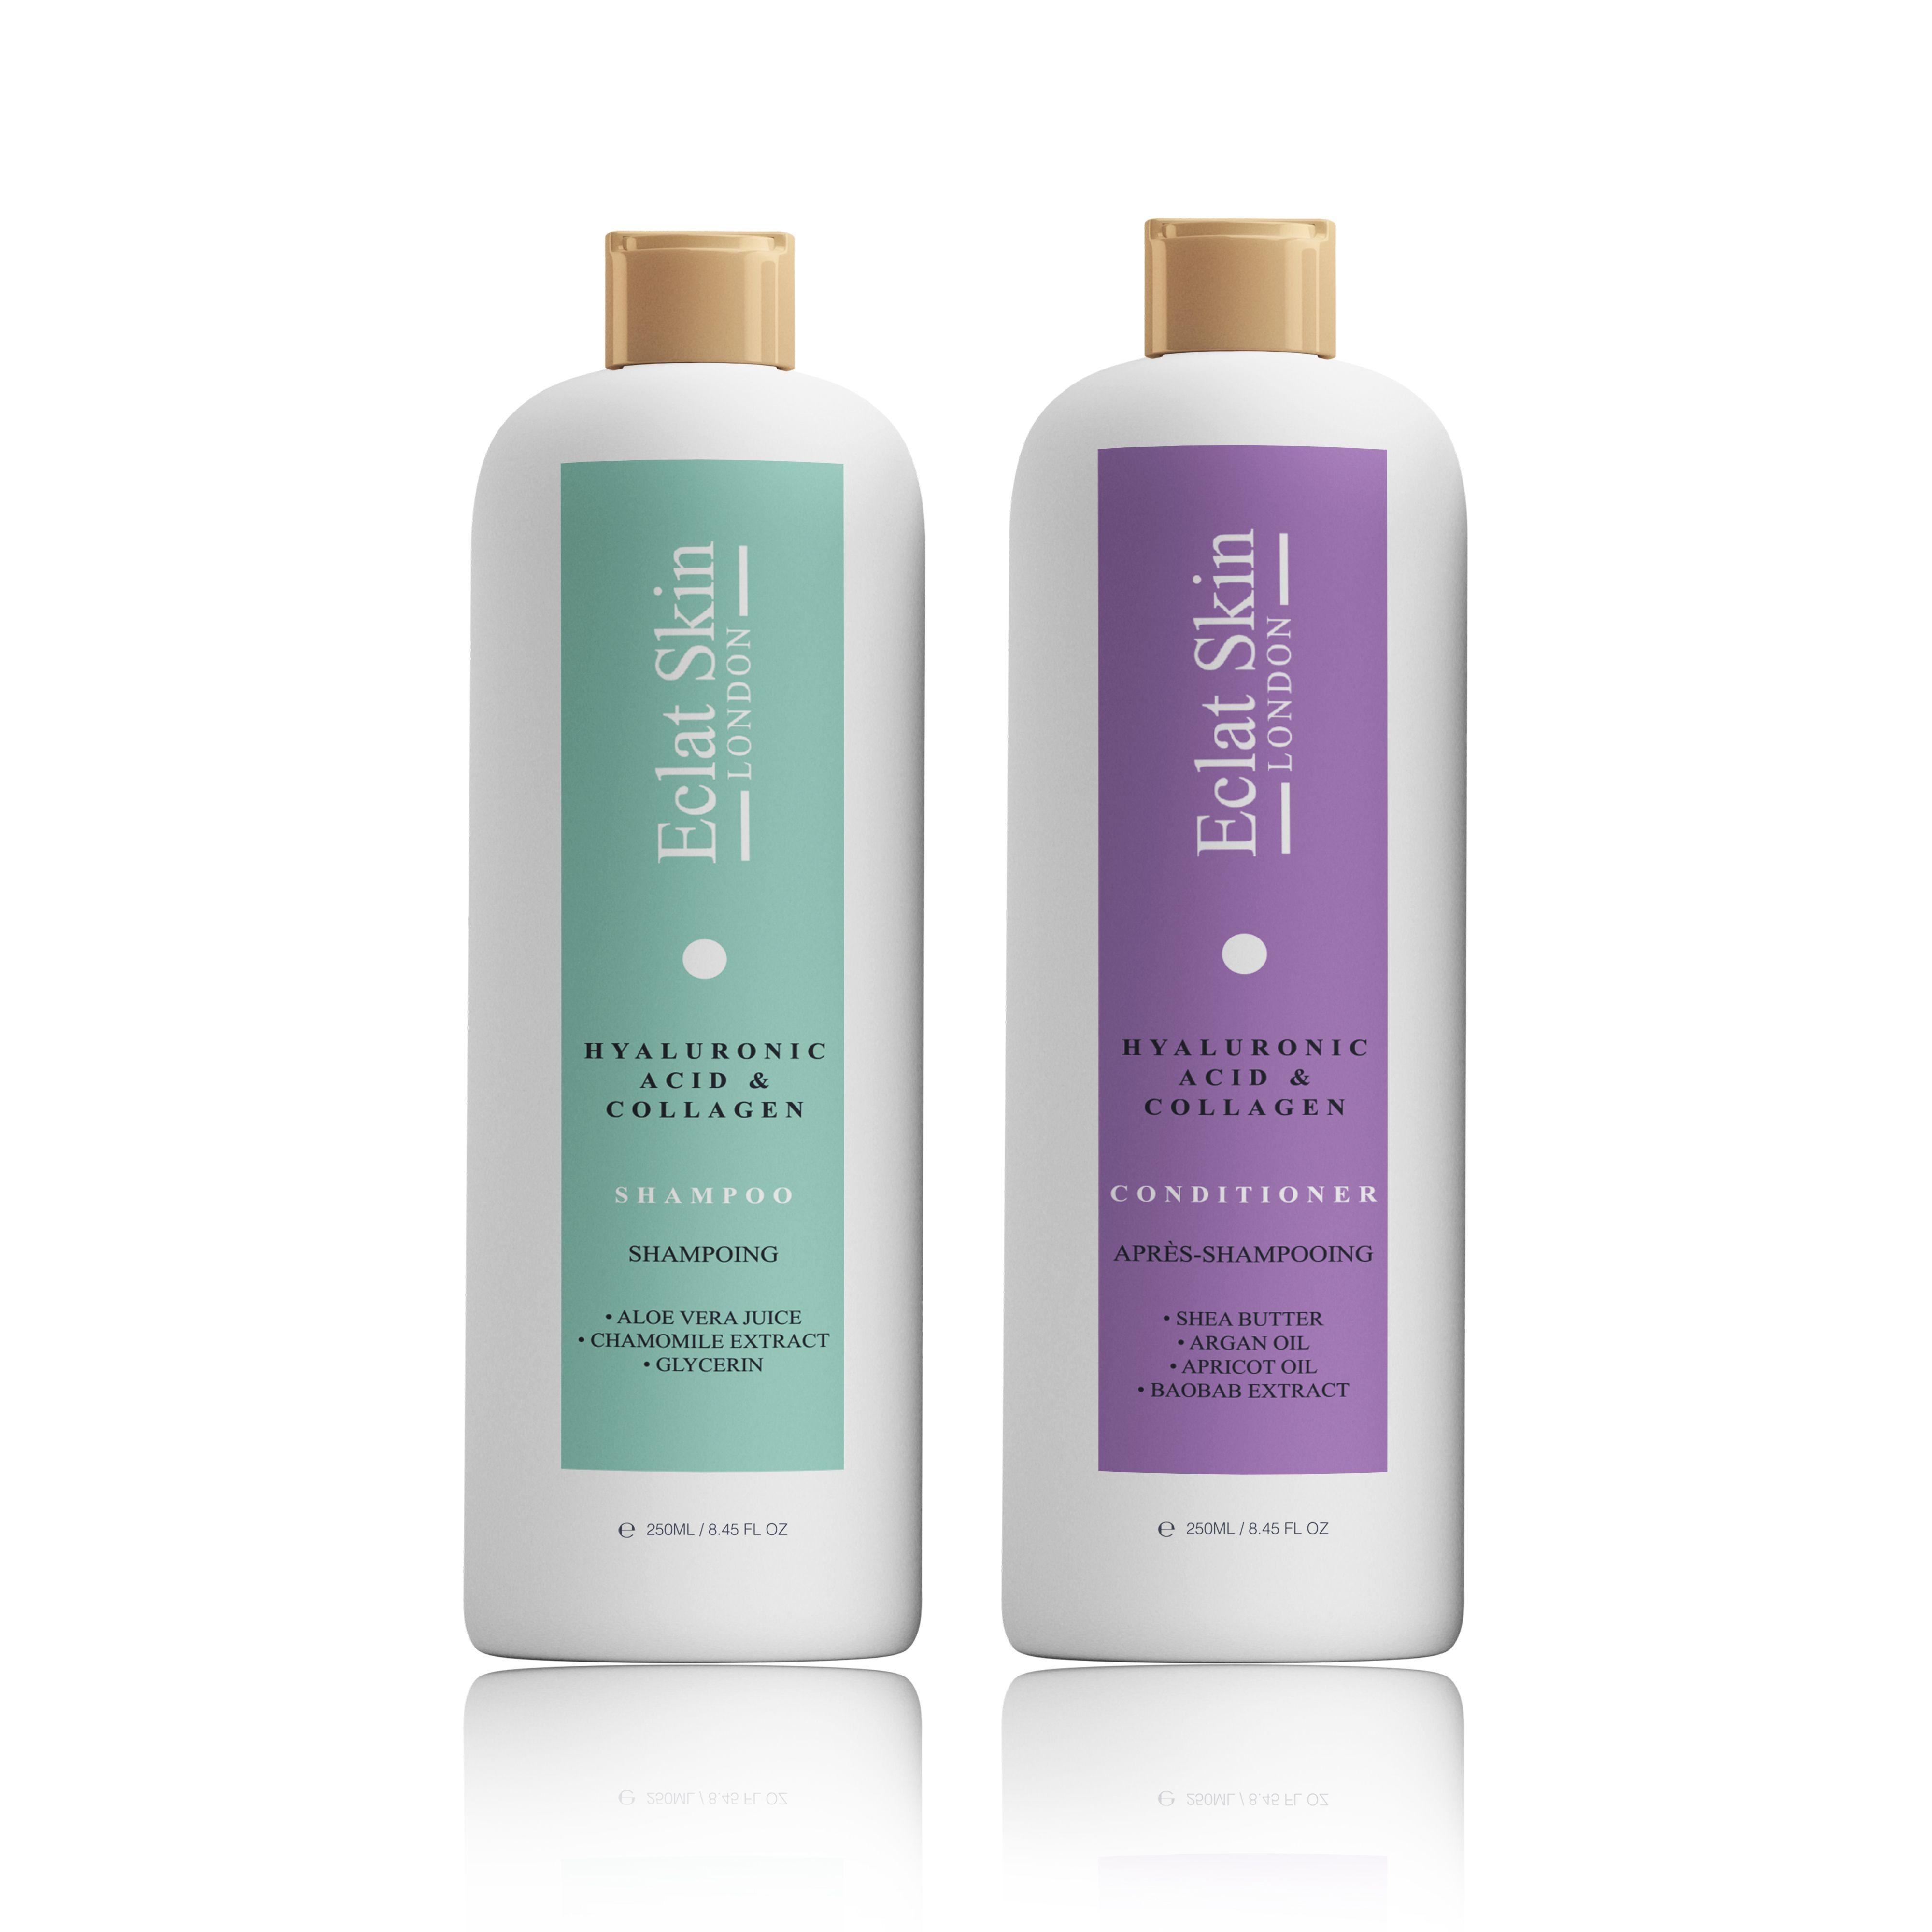 Hyaluronic Acid + Collagen Shampoo 250ml + Hyaluronic Acid + Collagen Conditioner 250ml